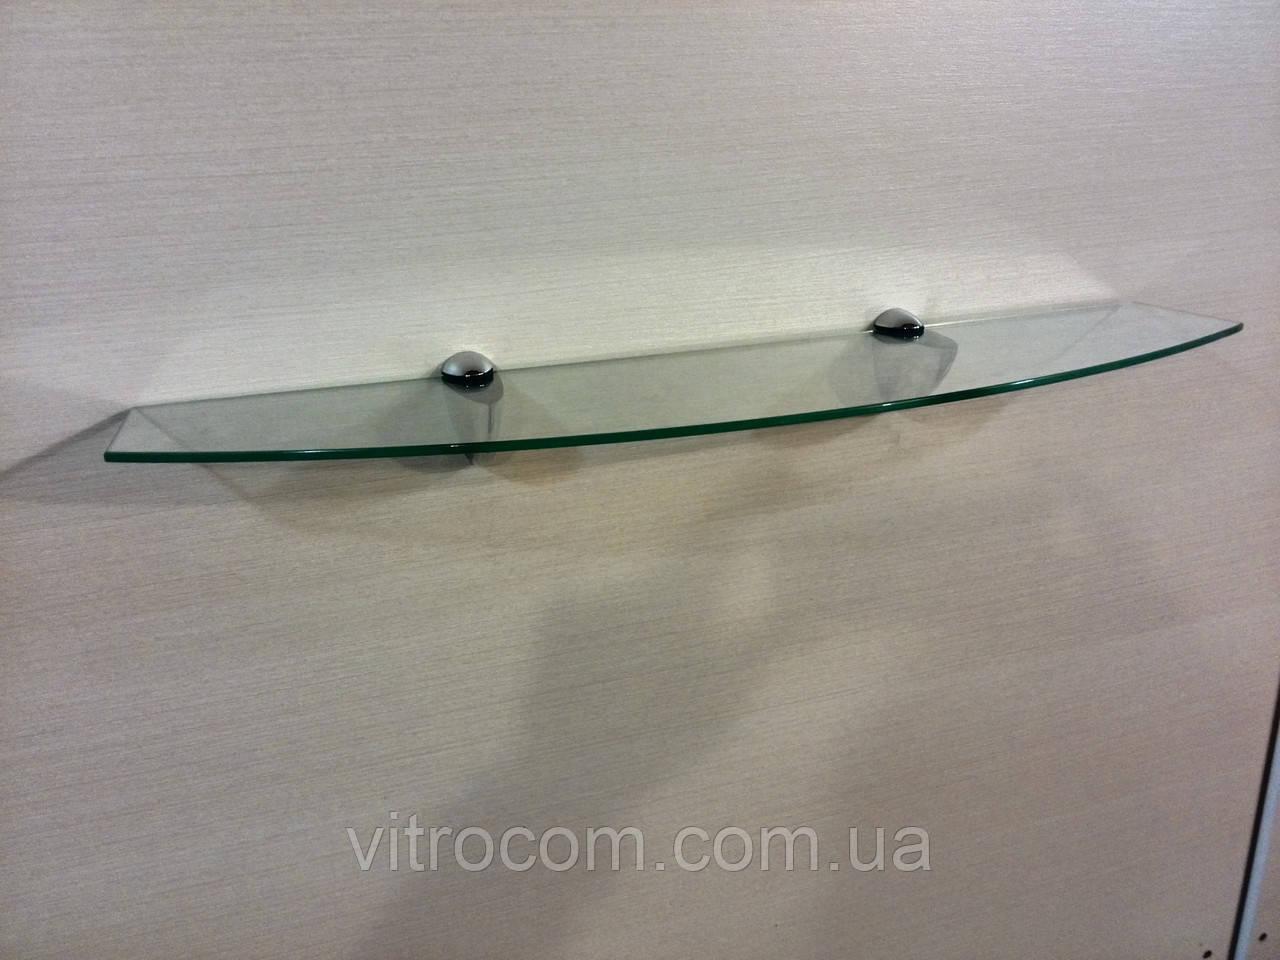 Полка стеклянная фигурная 4 мм прозрачная 53 х 15 см